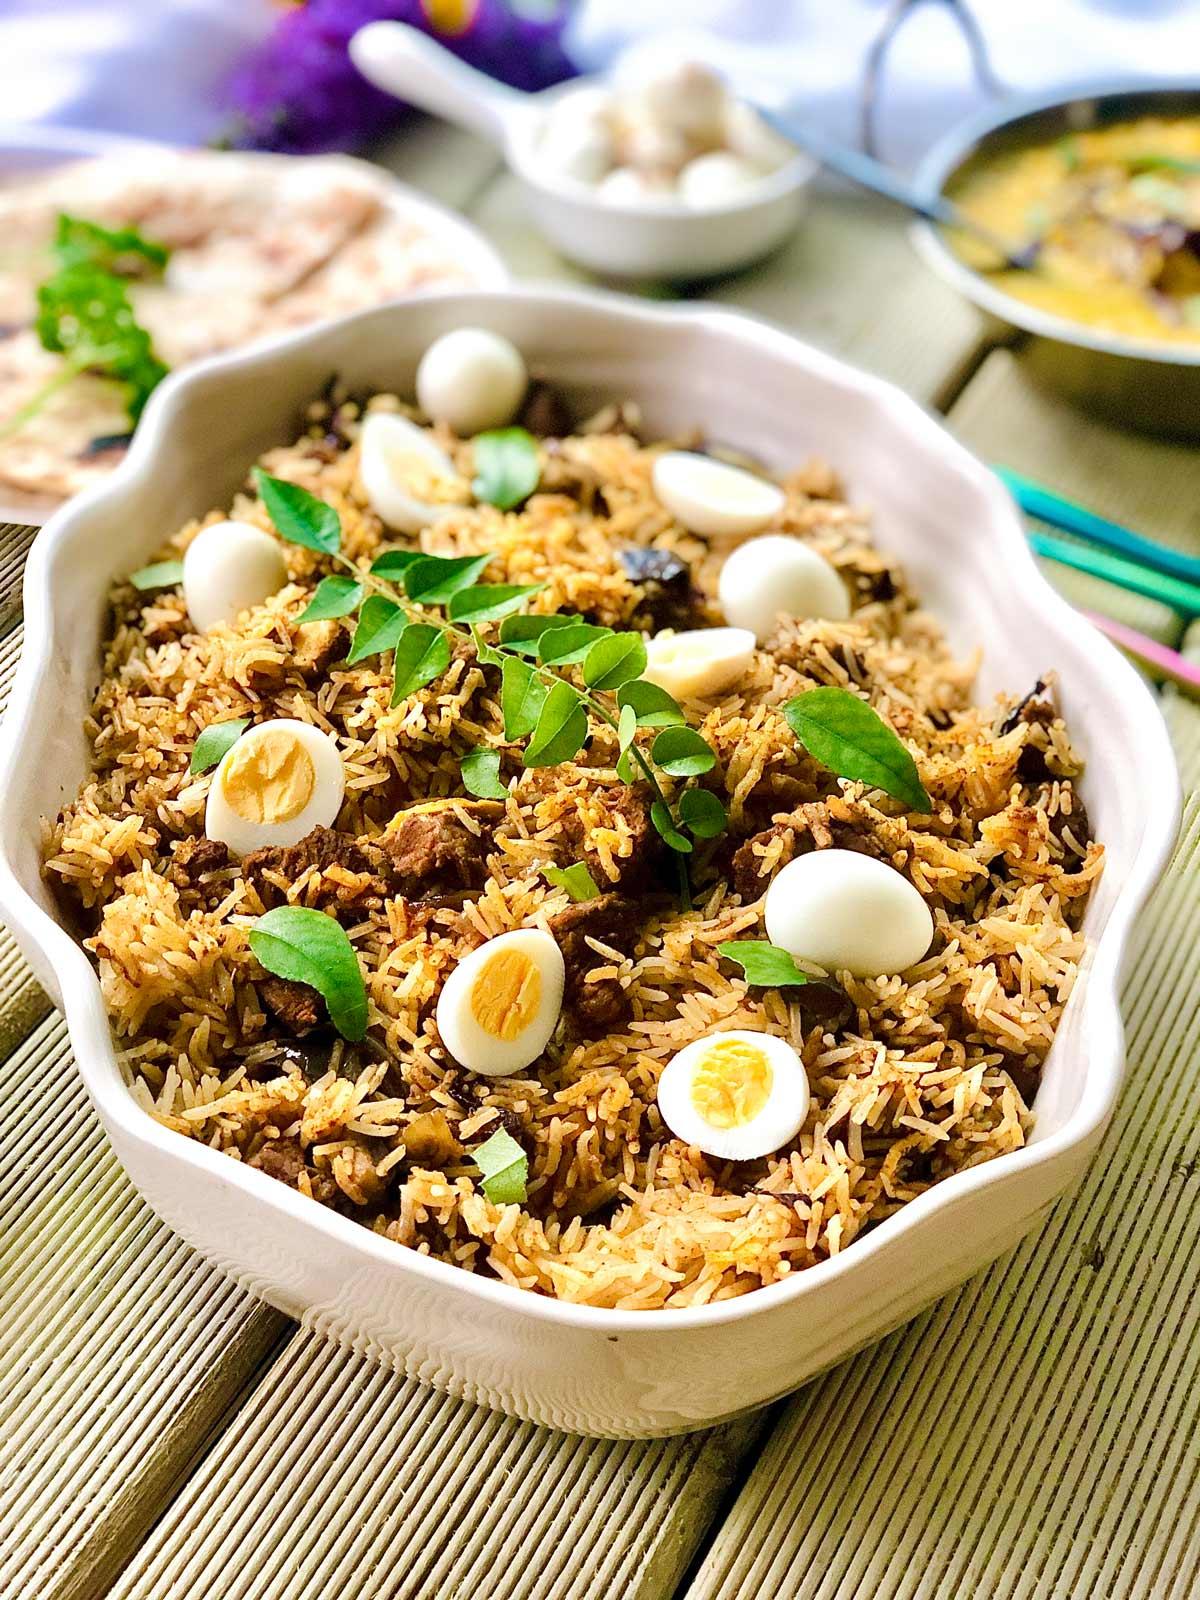 Lamb Biryani with Quail Eggs in a White Pot